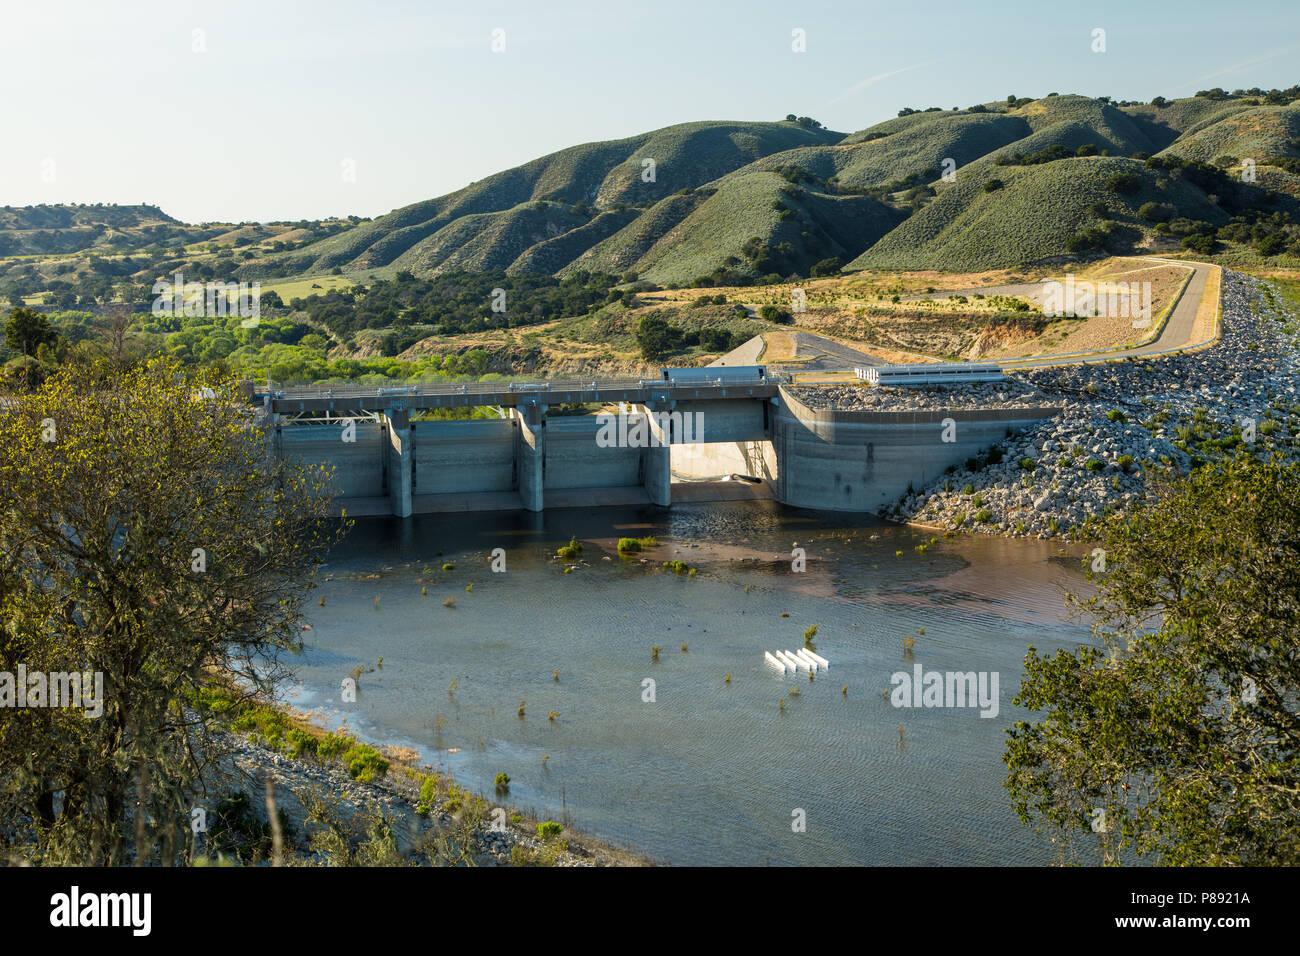 Santa ynez river stock photos santa ynez river stock images alamy lake cachuma dam in the drought in santa ynez valley california stock image freerunsca Gallery